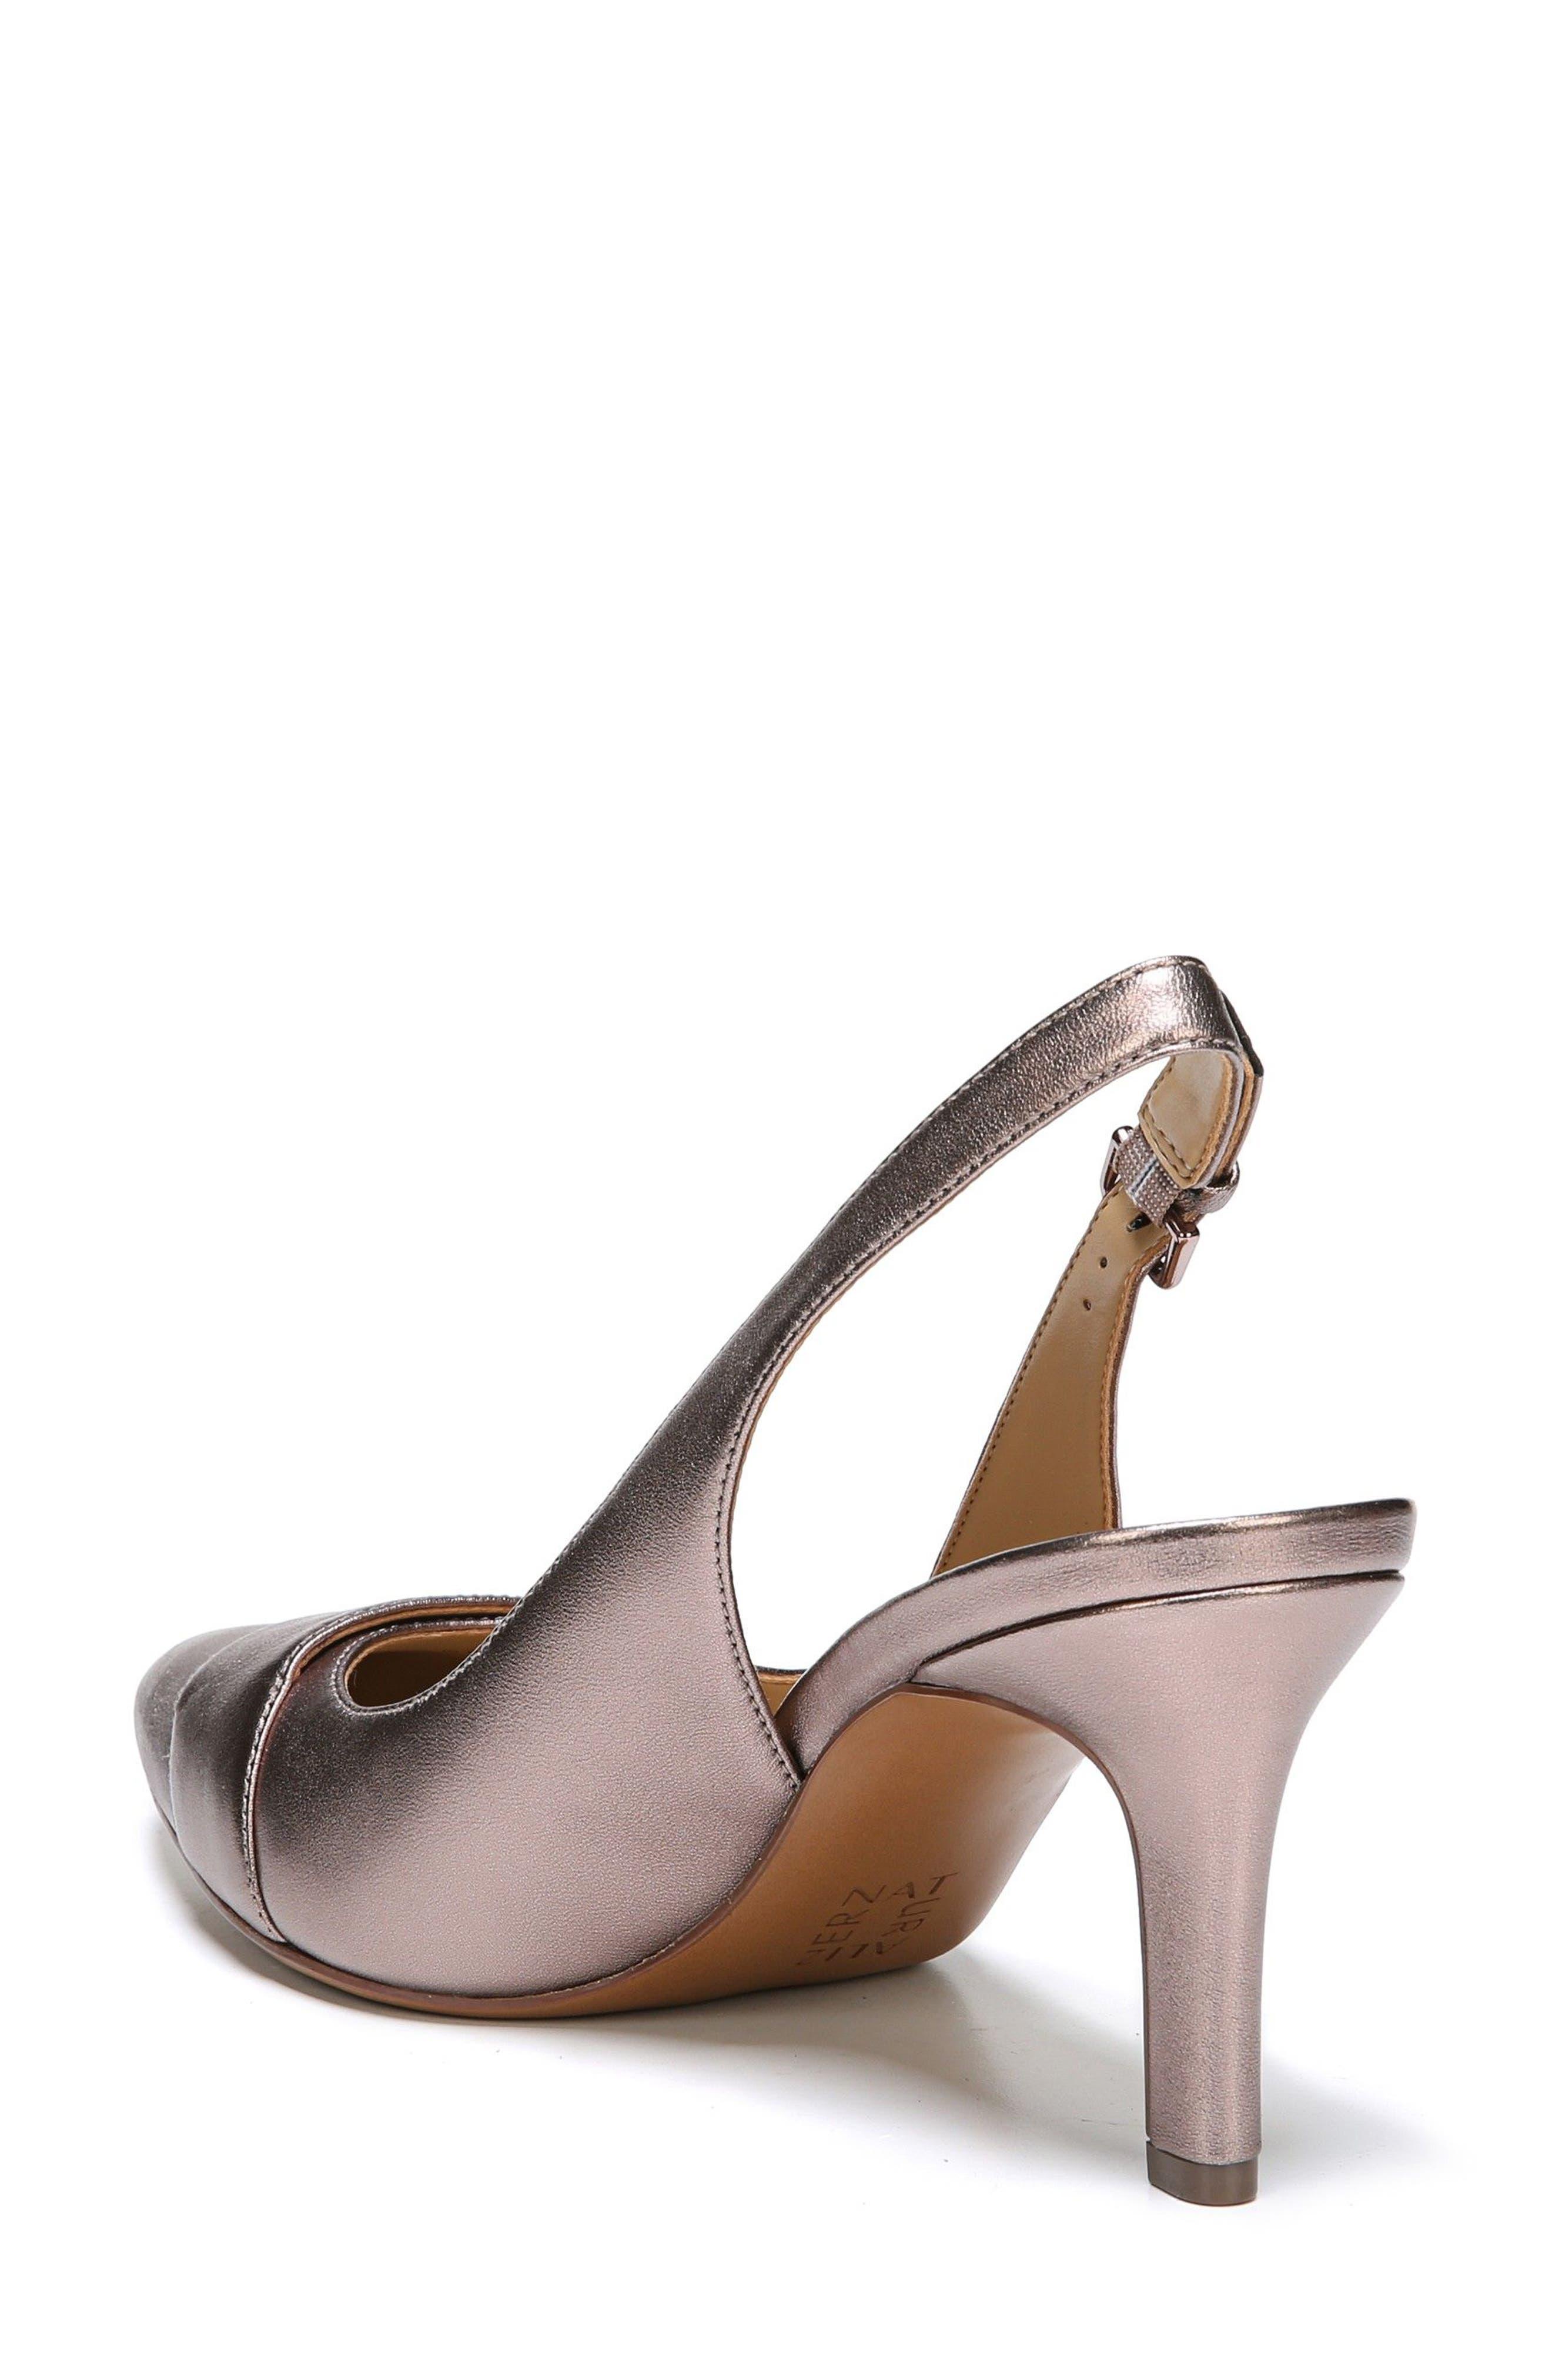 Nicolette Slingback Pump,                             Alternate thumbnail 2, color,                             Bronze Alloy Metallic Leather